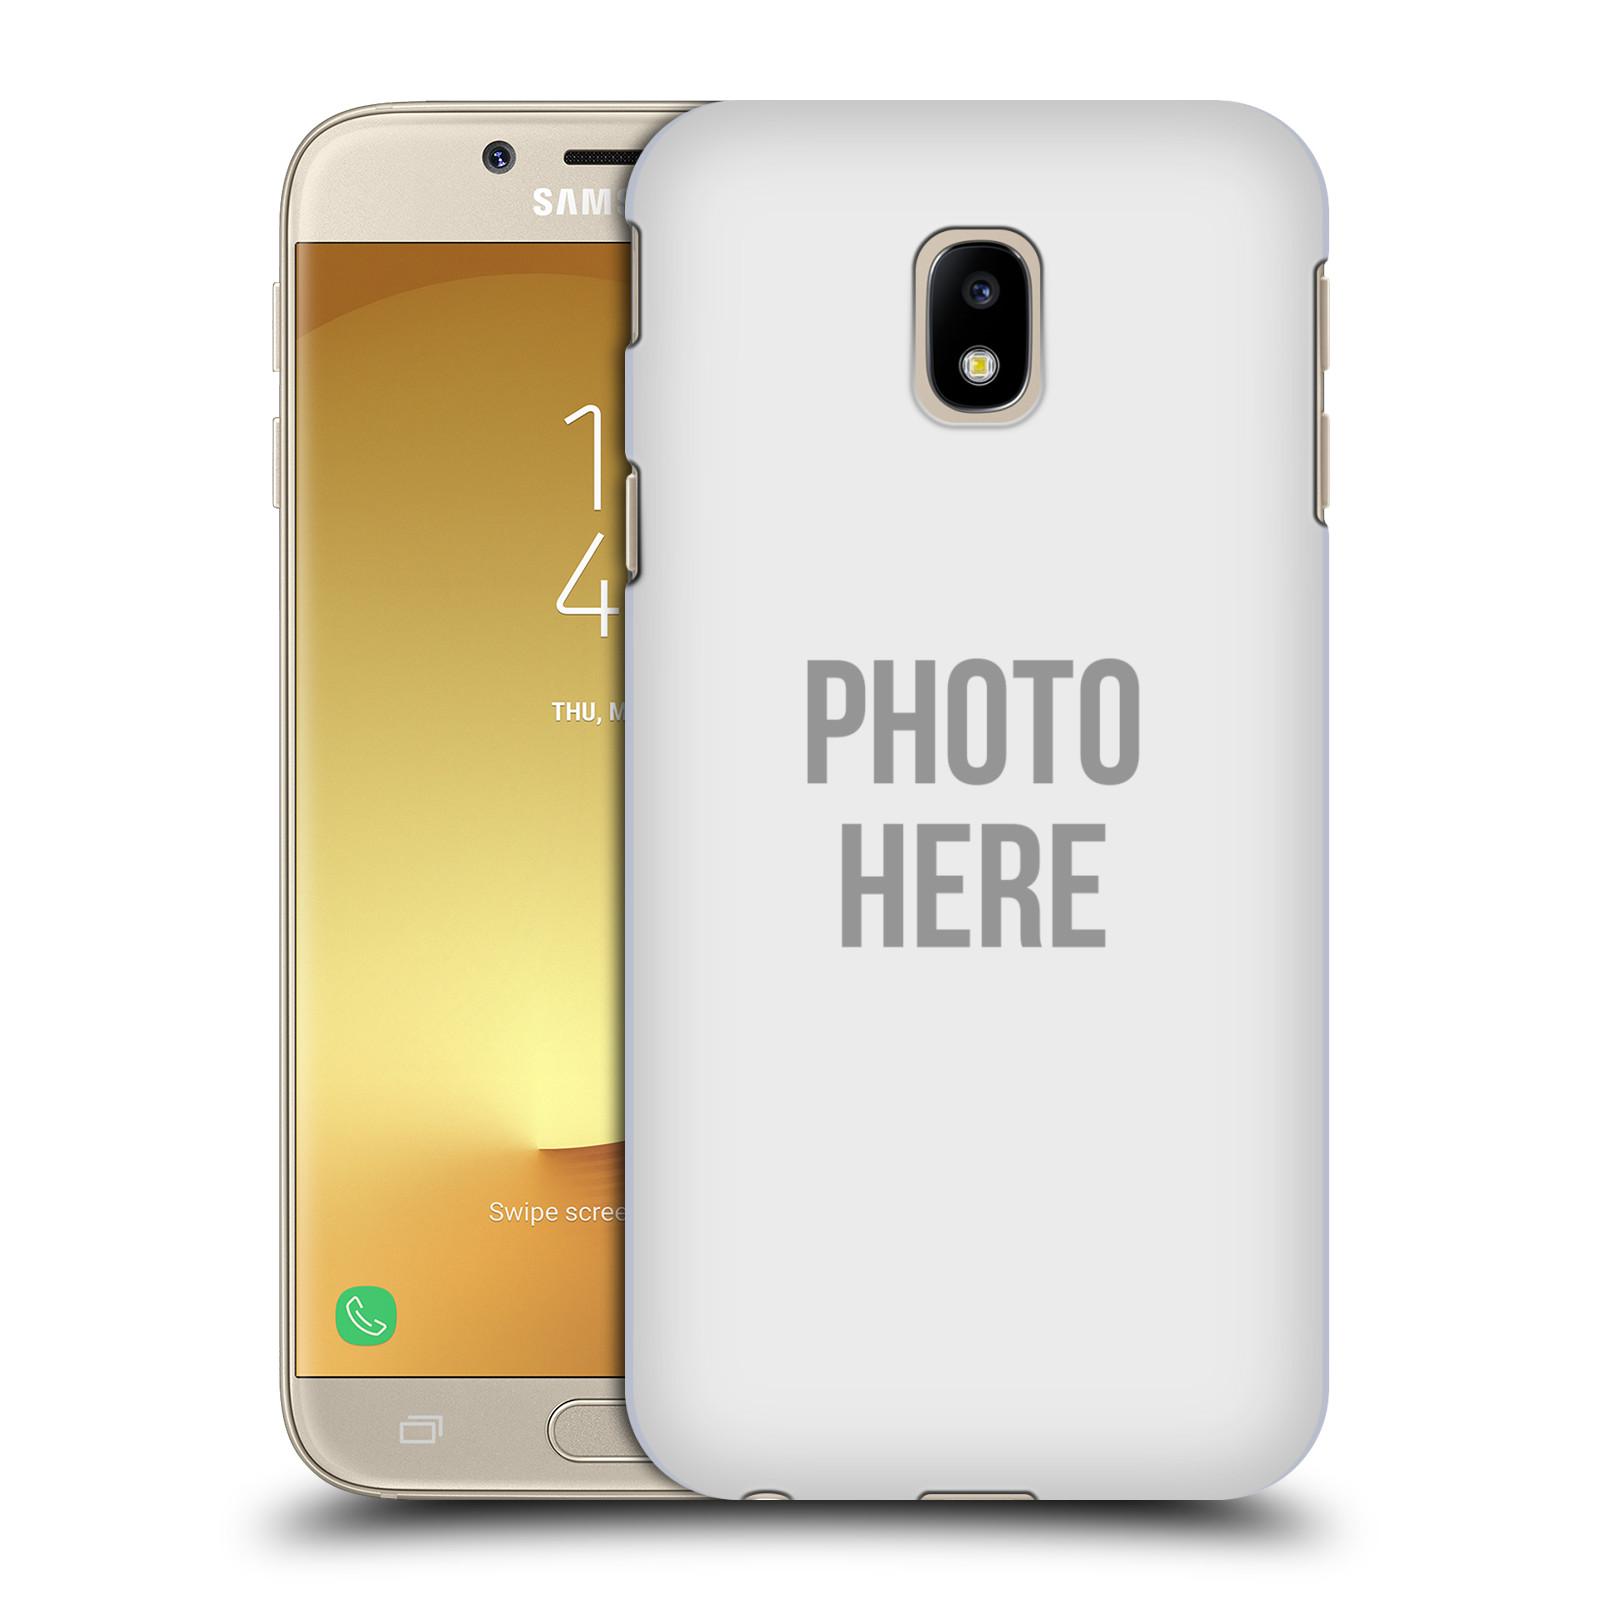 Plastové pouzdro na mobil Samsung Galaxy J3 (2017) - Head Case - s vlastním motivem